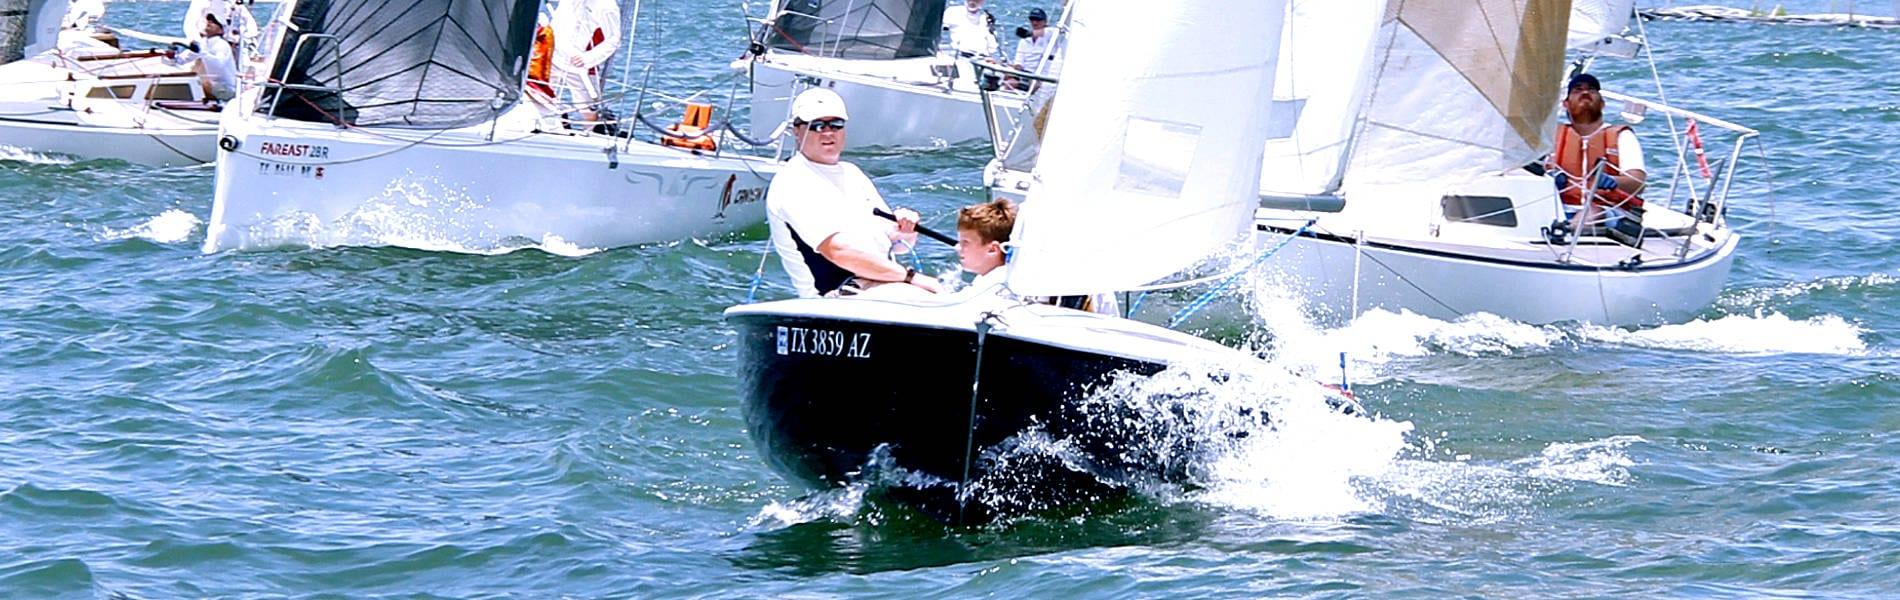 Home - Lake Canyon Yacht Club